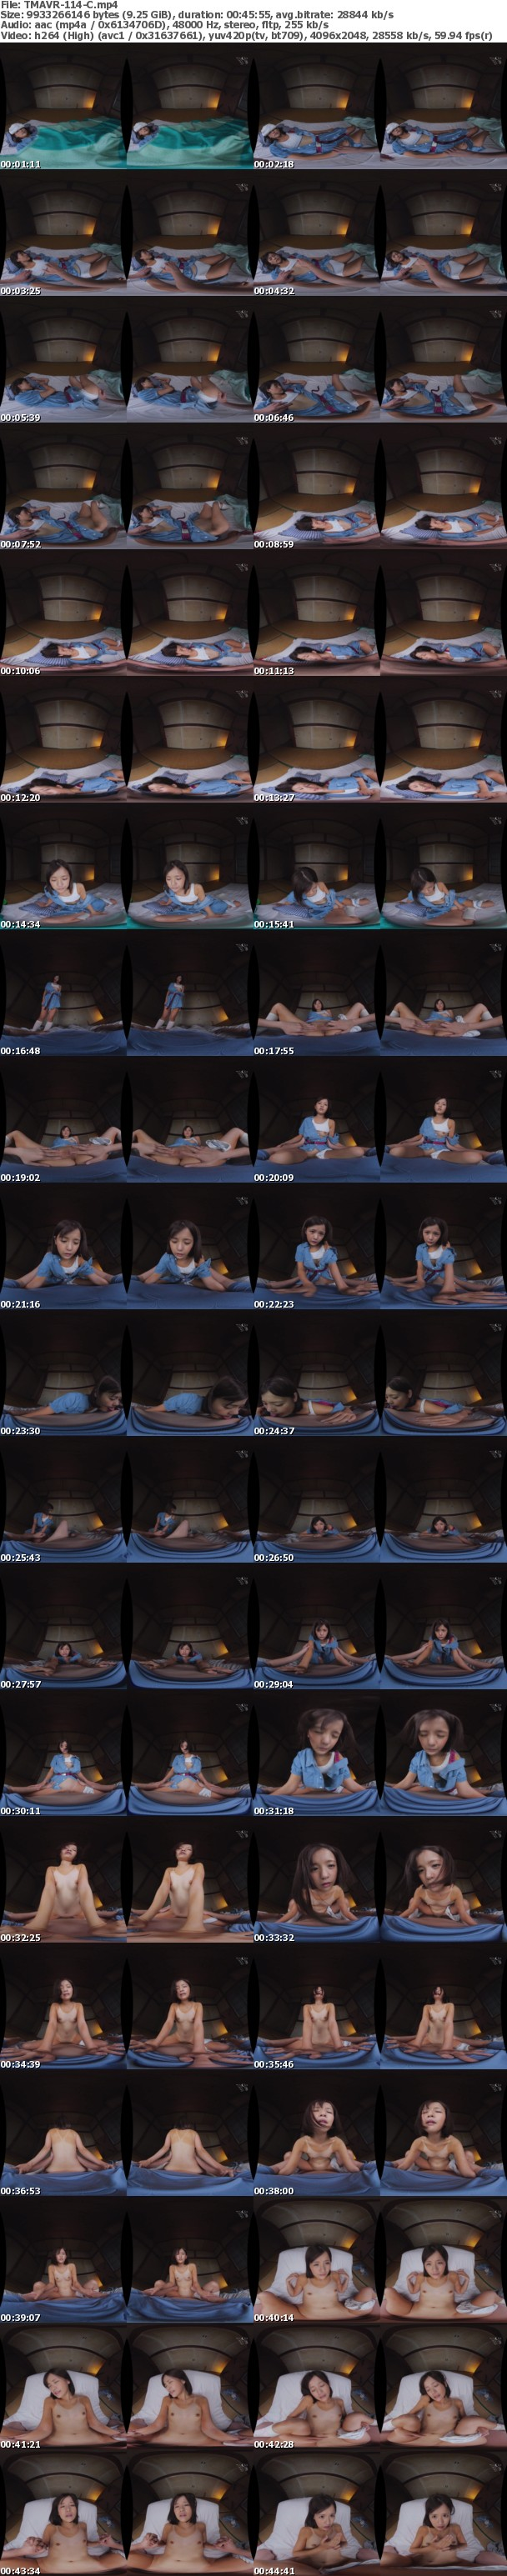 (VR) TMAVR-114 都会から自然教室に来た3年2組の女の子~キャンプ場管理人による日焼け美少女わいせつ性交~